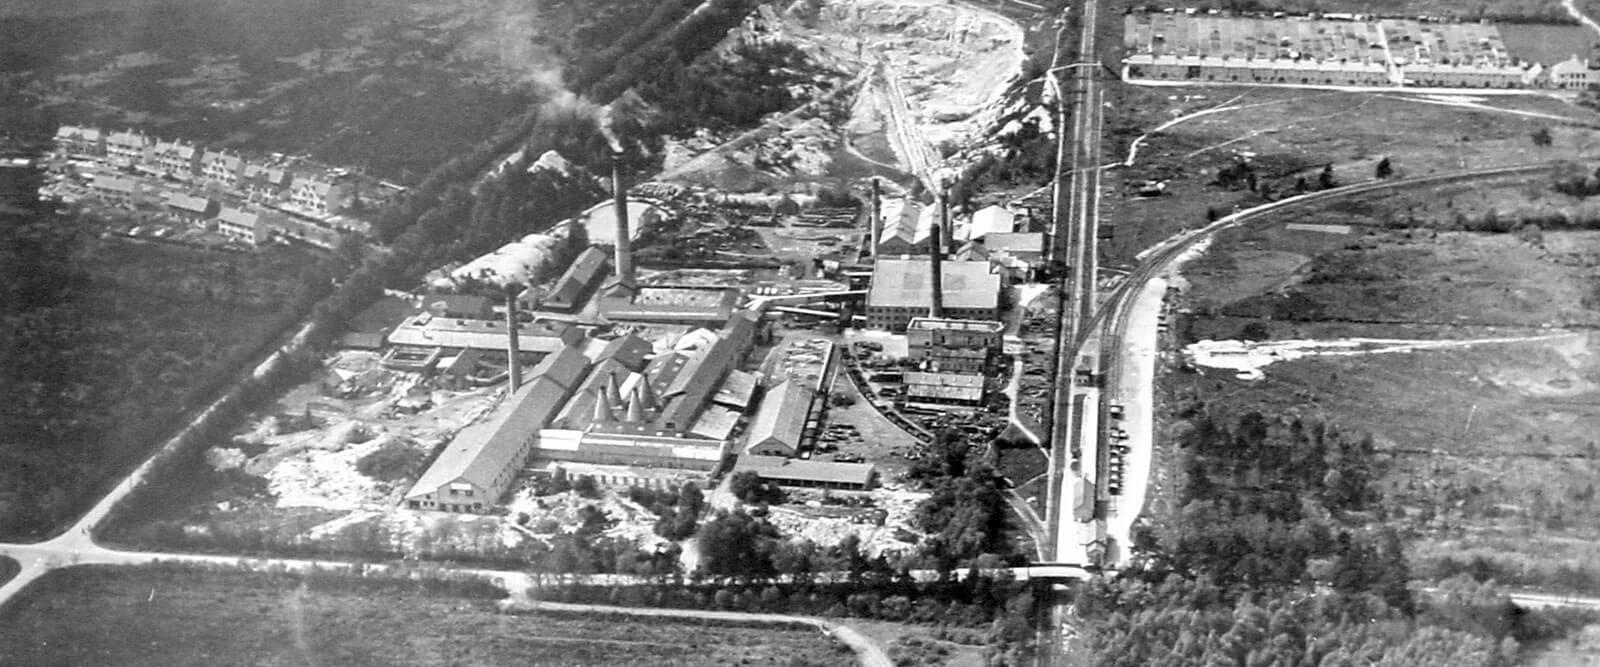 The Original Candy Tiles Factory